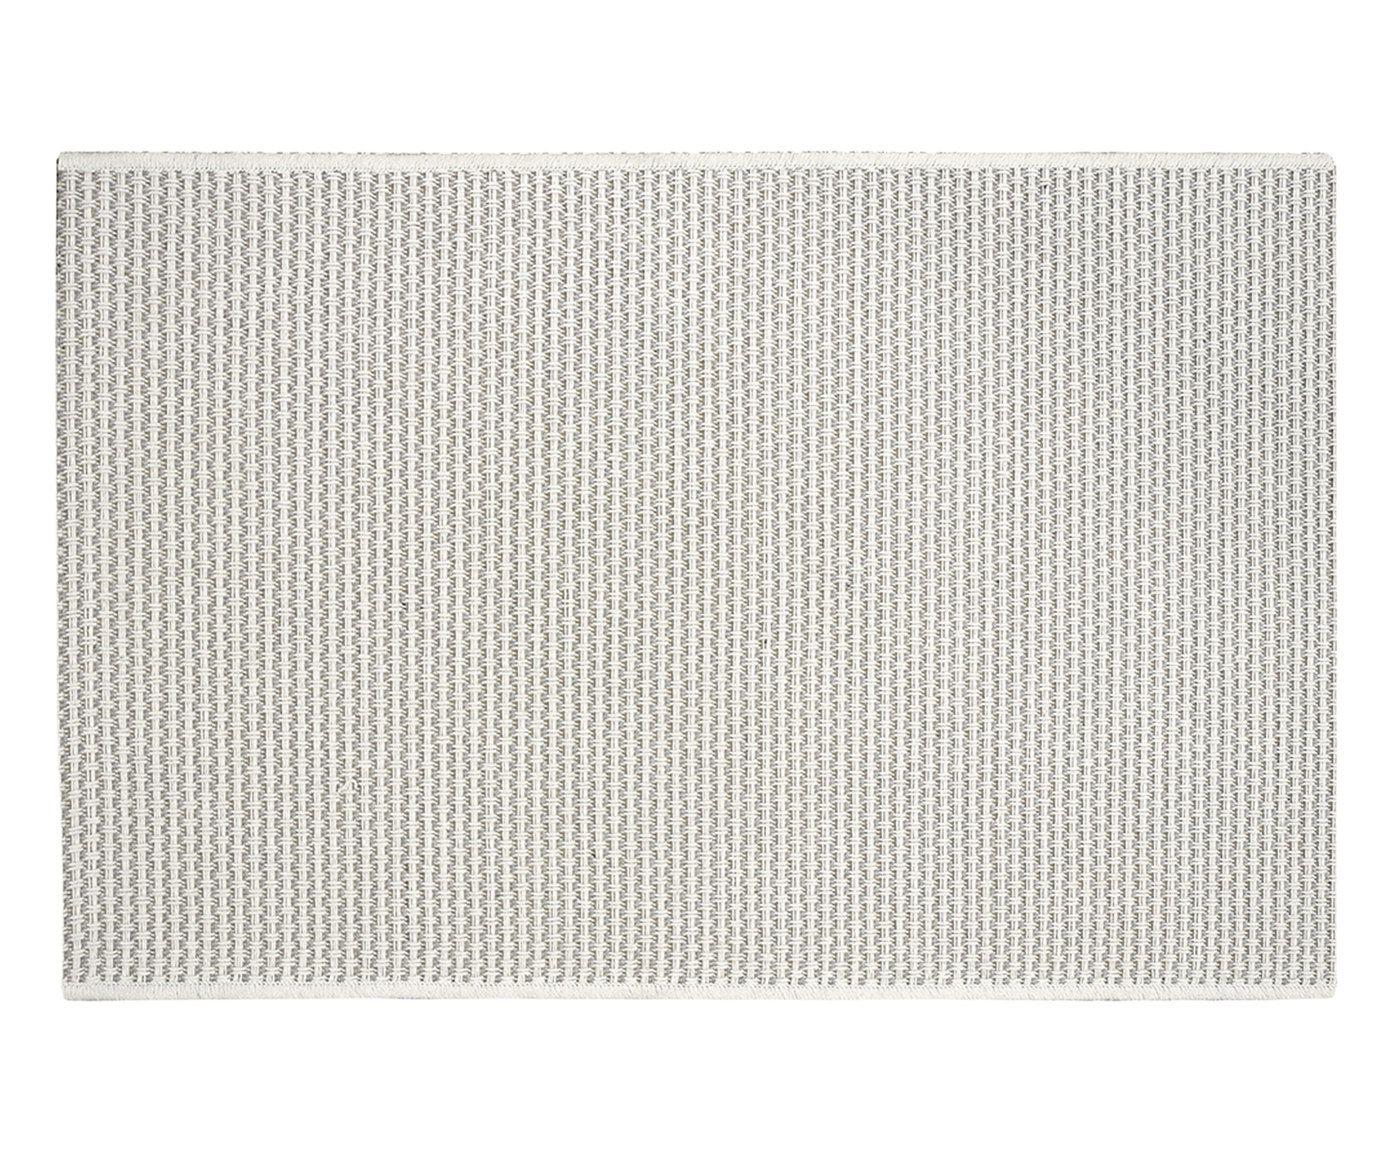 Tapete Cotton Texture Cru - 160X235cm | Westwing.com.br